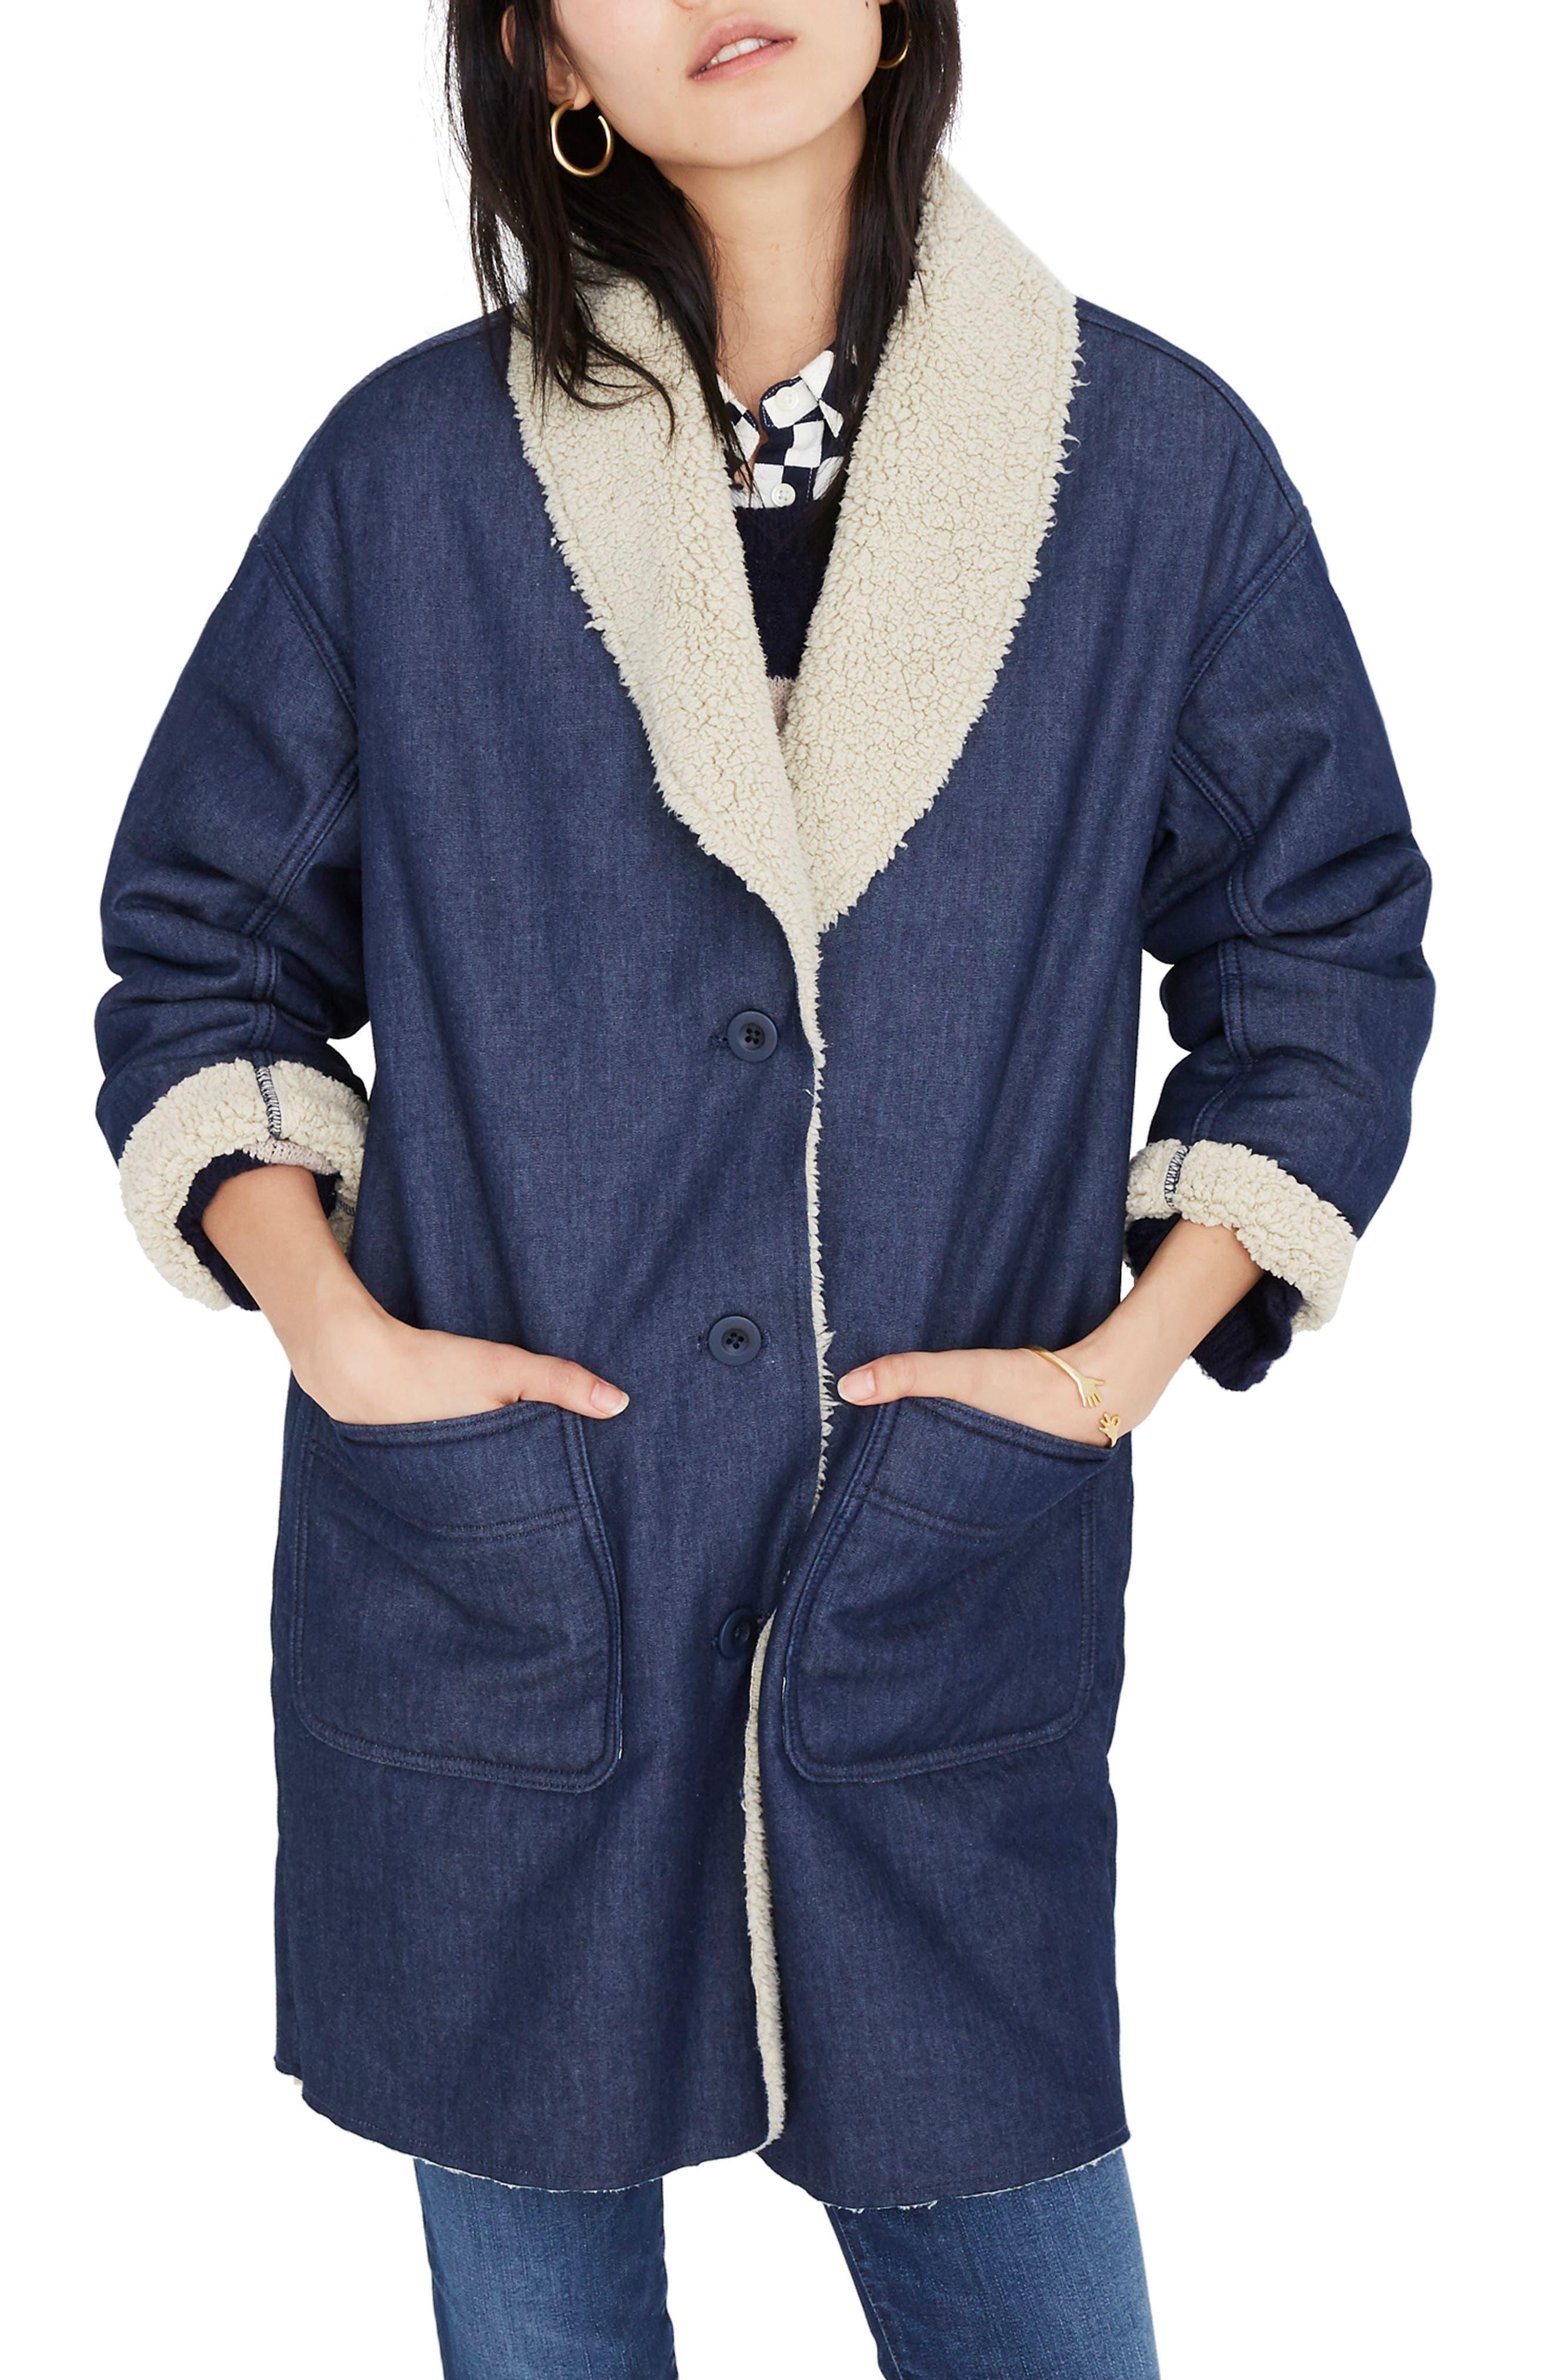 MADEWELL, Fleece Trim Denim Cocoon Coat, Main thumbnail 1, color, BRUNSWICK WASH